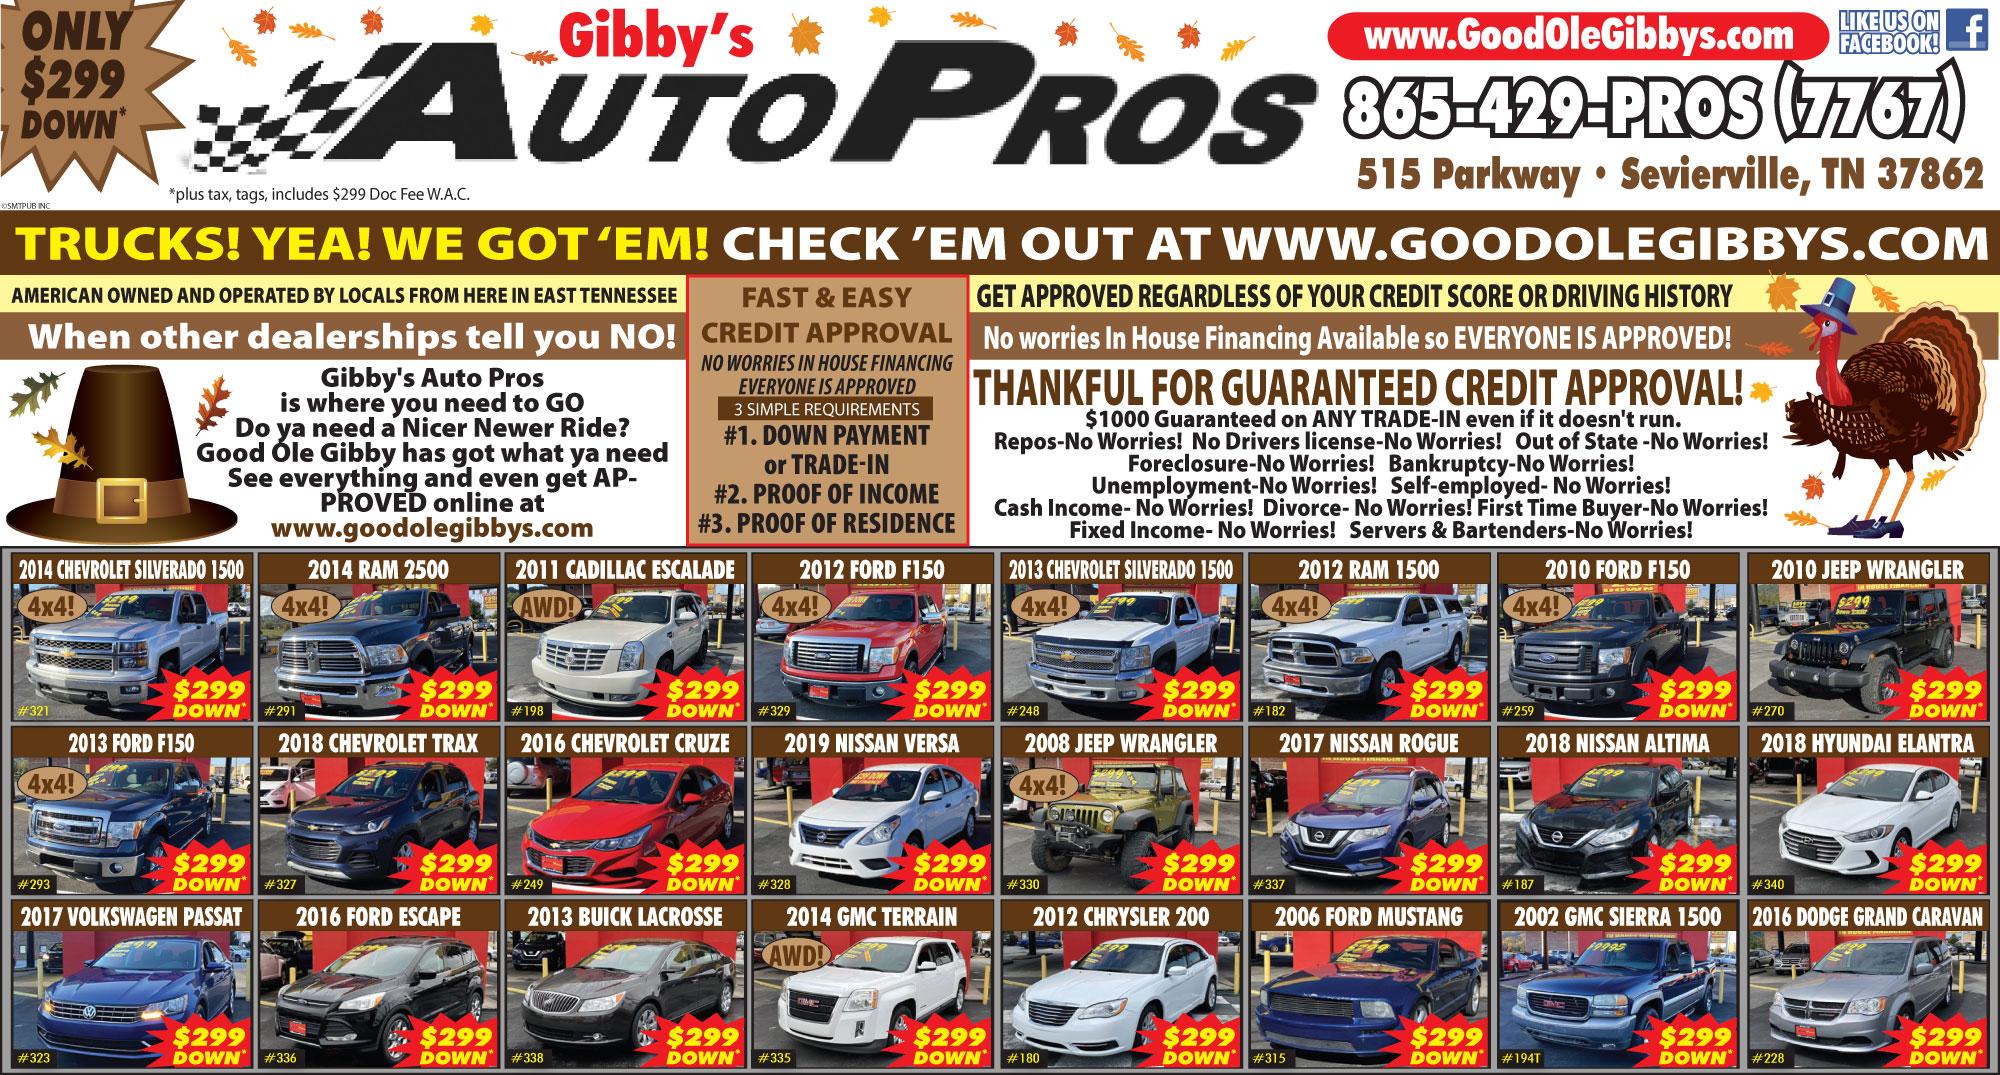 Gibby's Auto Pros